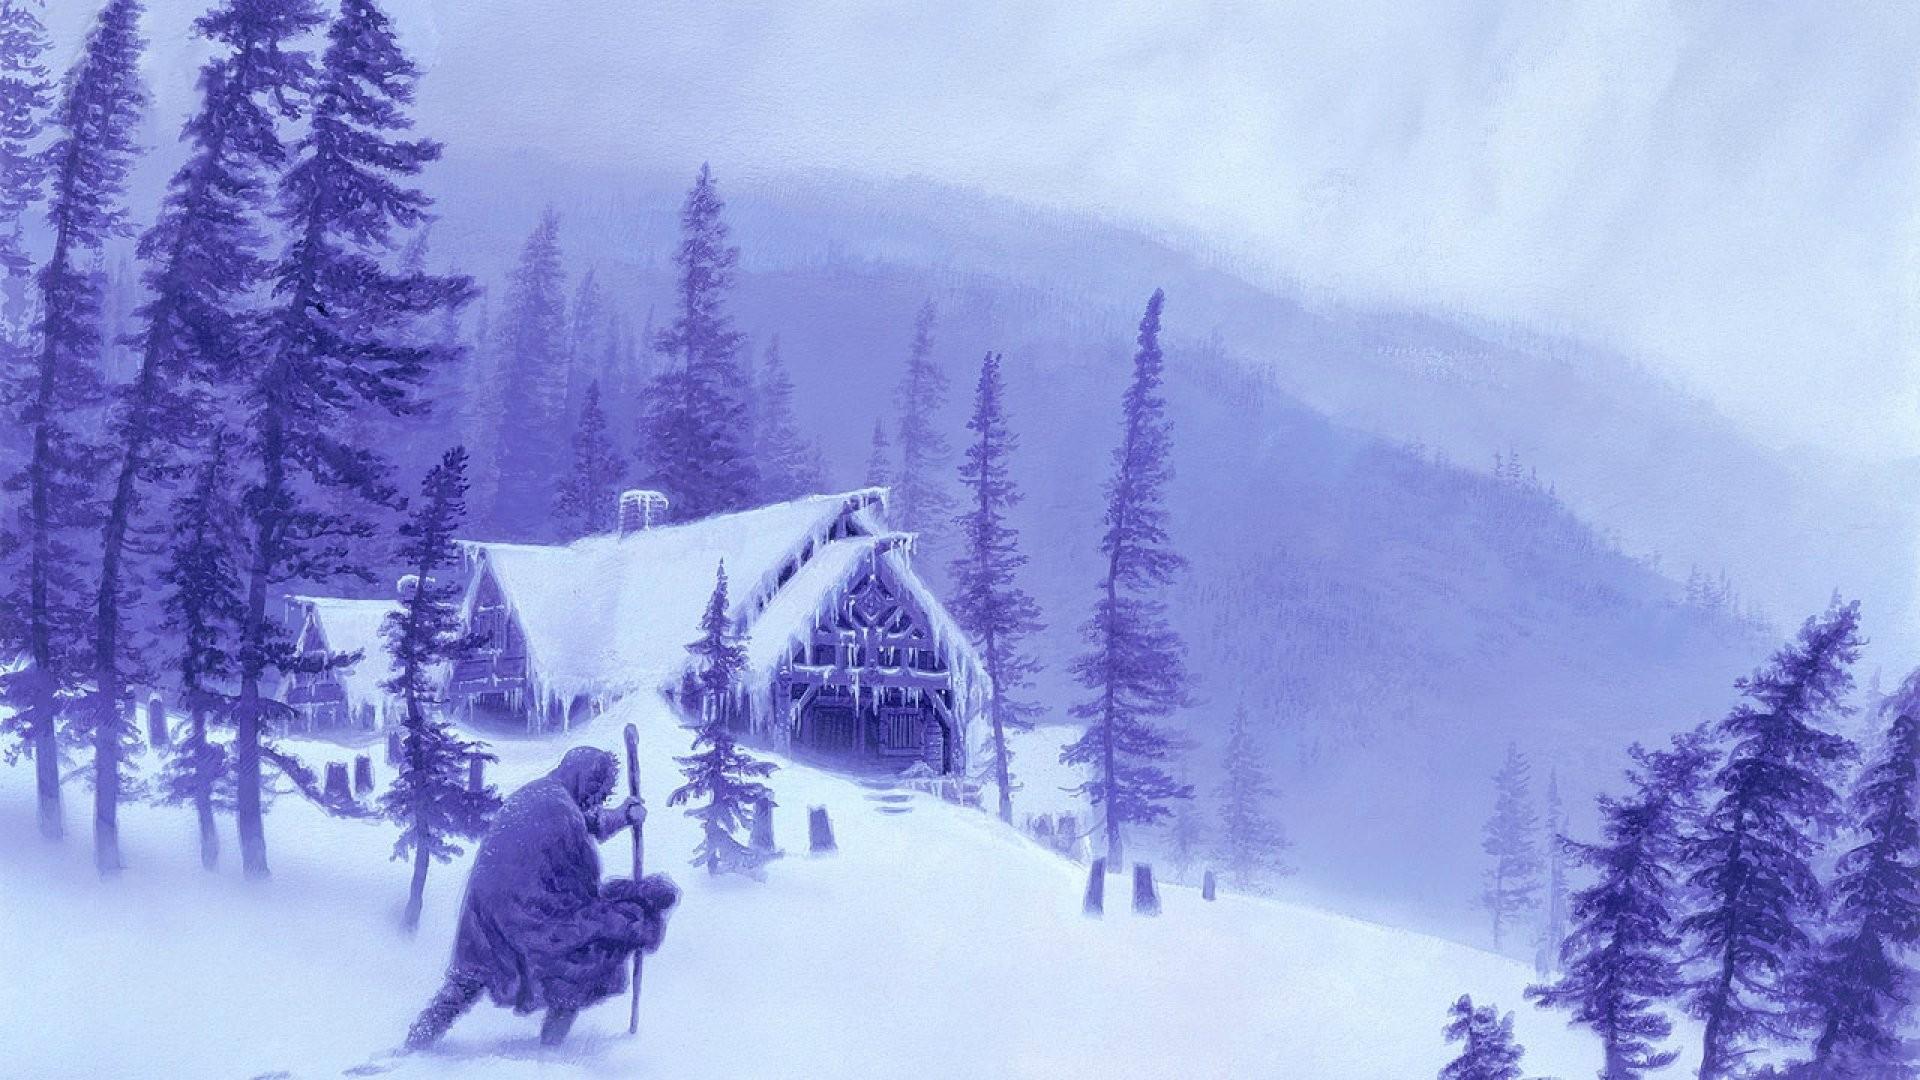 paisaje nevado imagen de fondo de pantalla